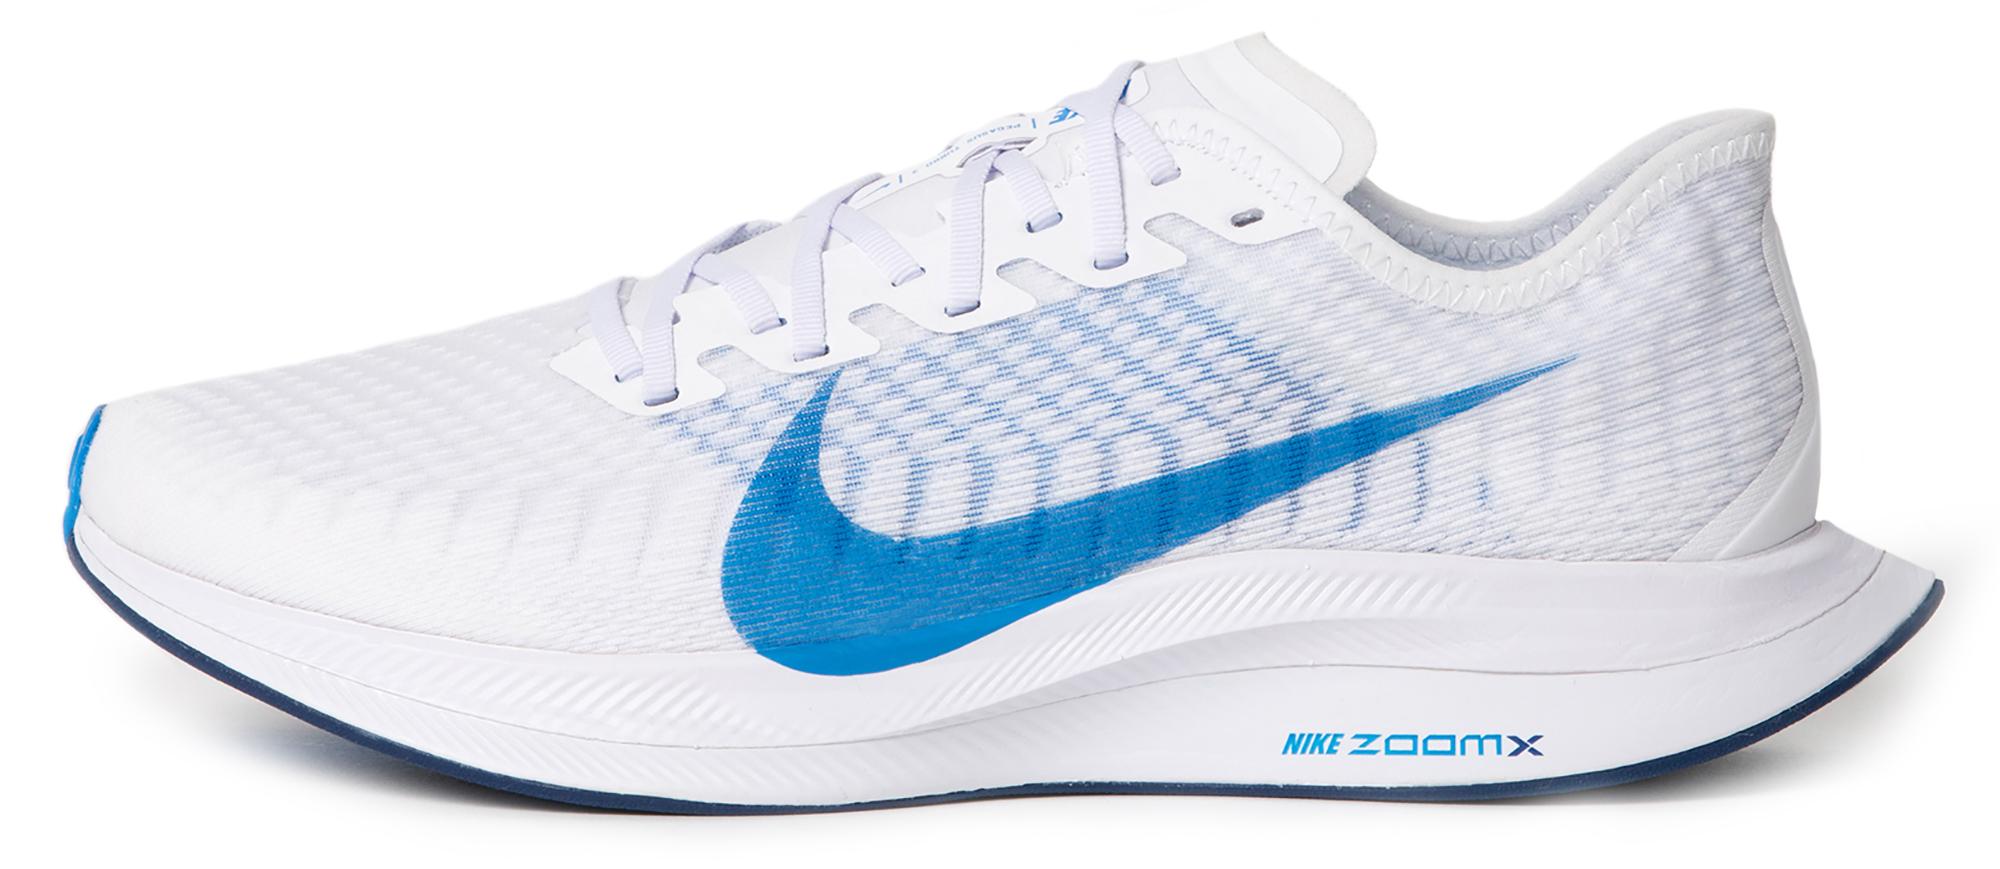 велосипед pegasus comfort sl 7 sp 28 2016 Nike Кроссовки мужские Nike Zoom Pegasus Turbo 2, размер 46.5